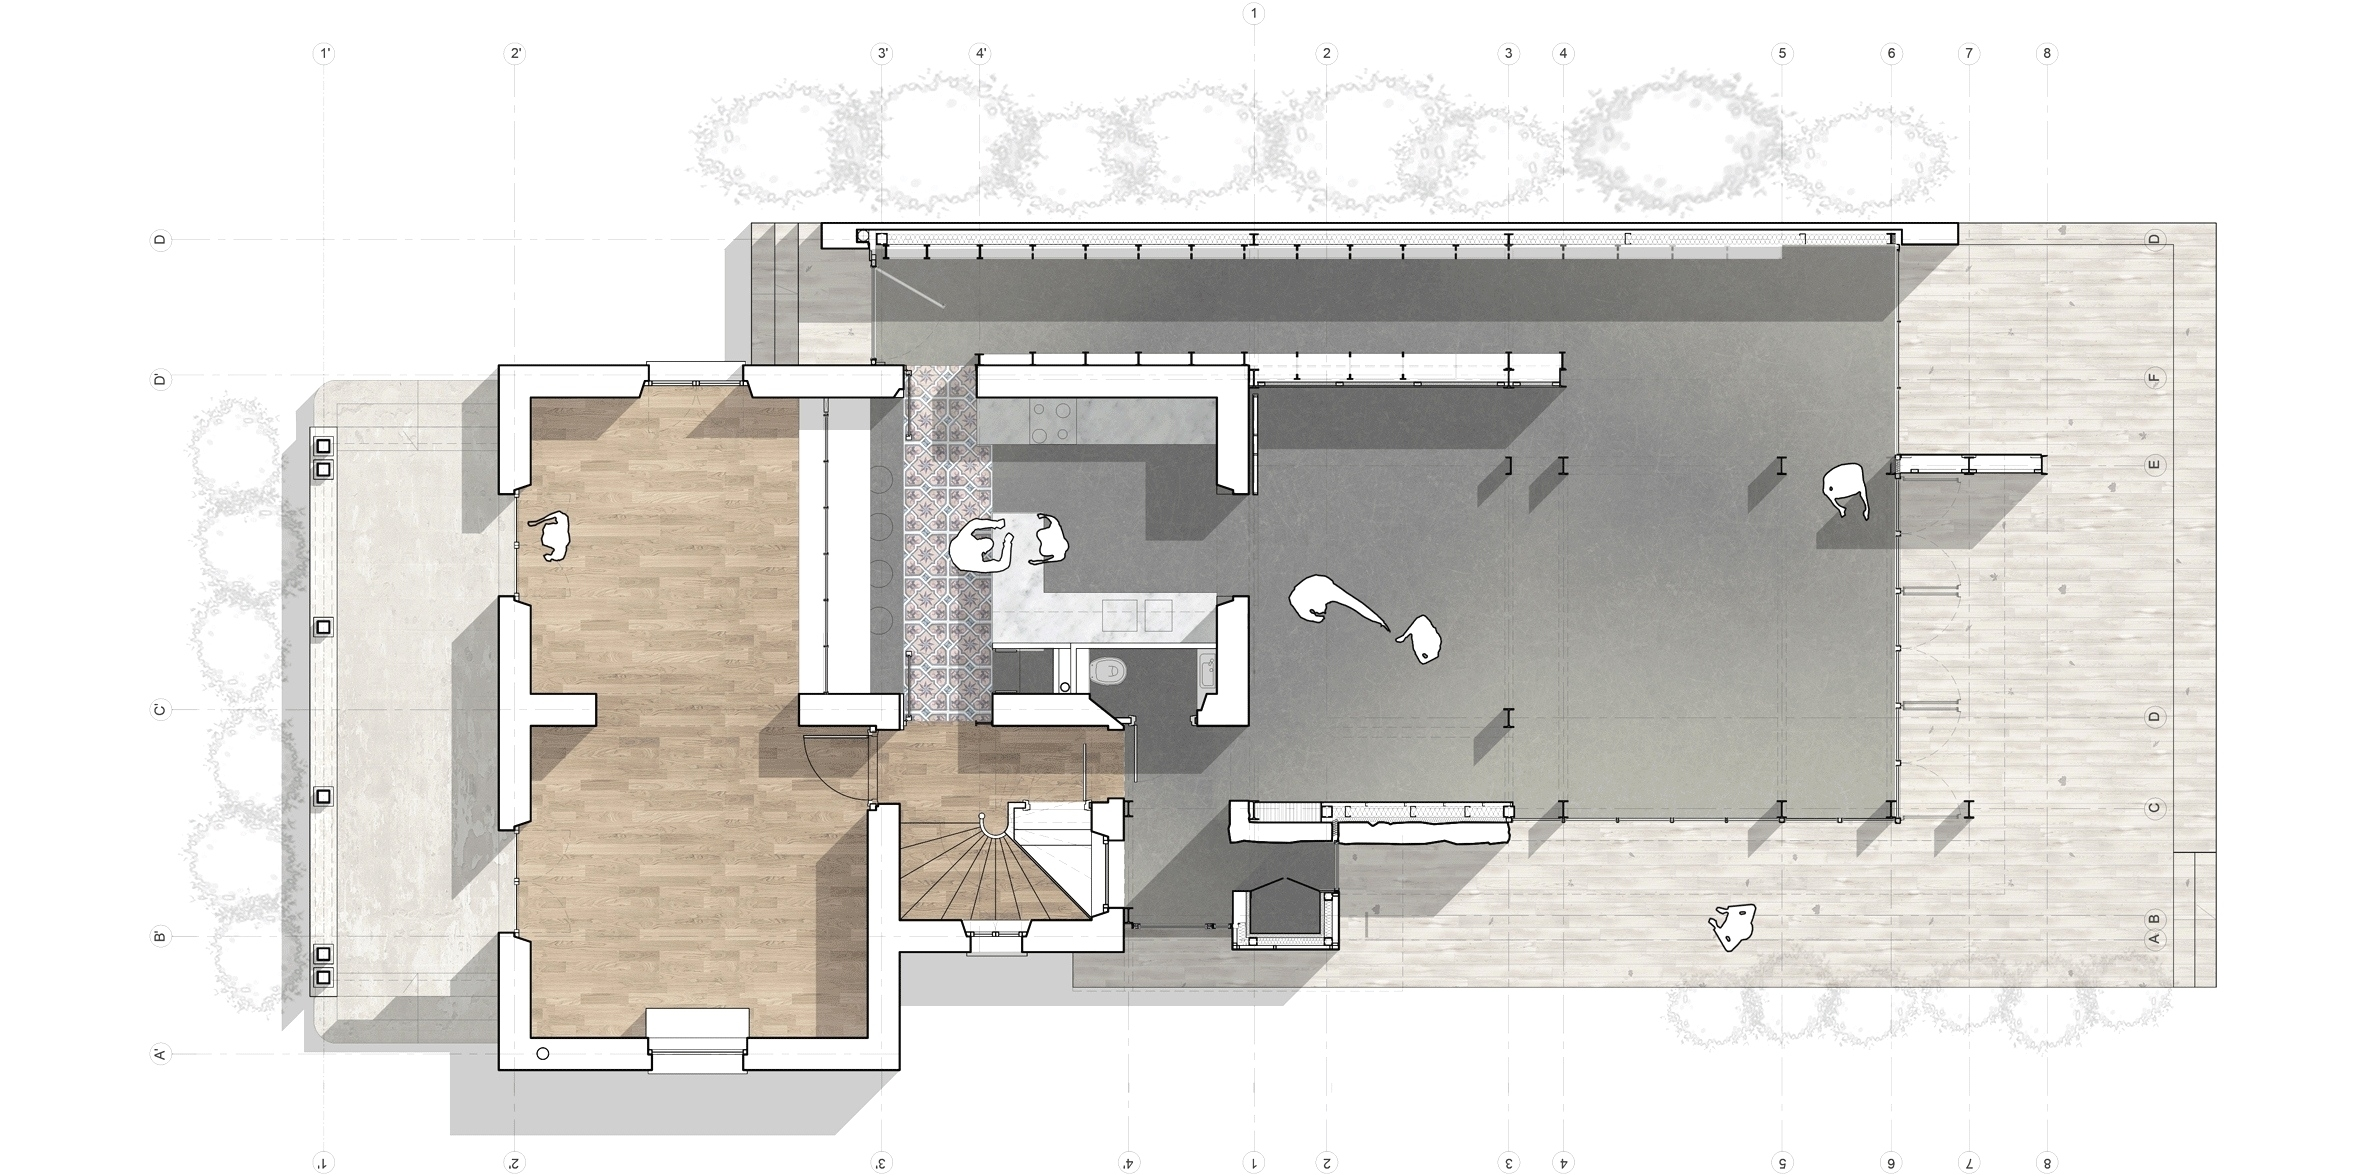 rent realtor home plans baton rouge steel metal building house plans bibserver